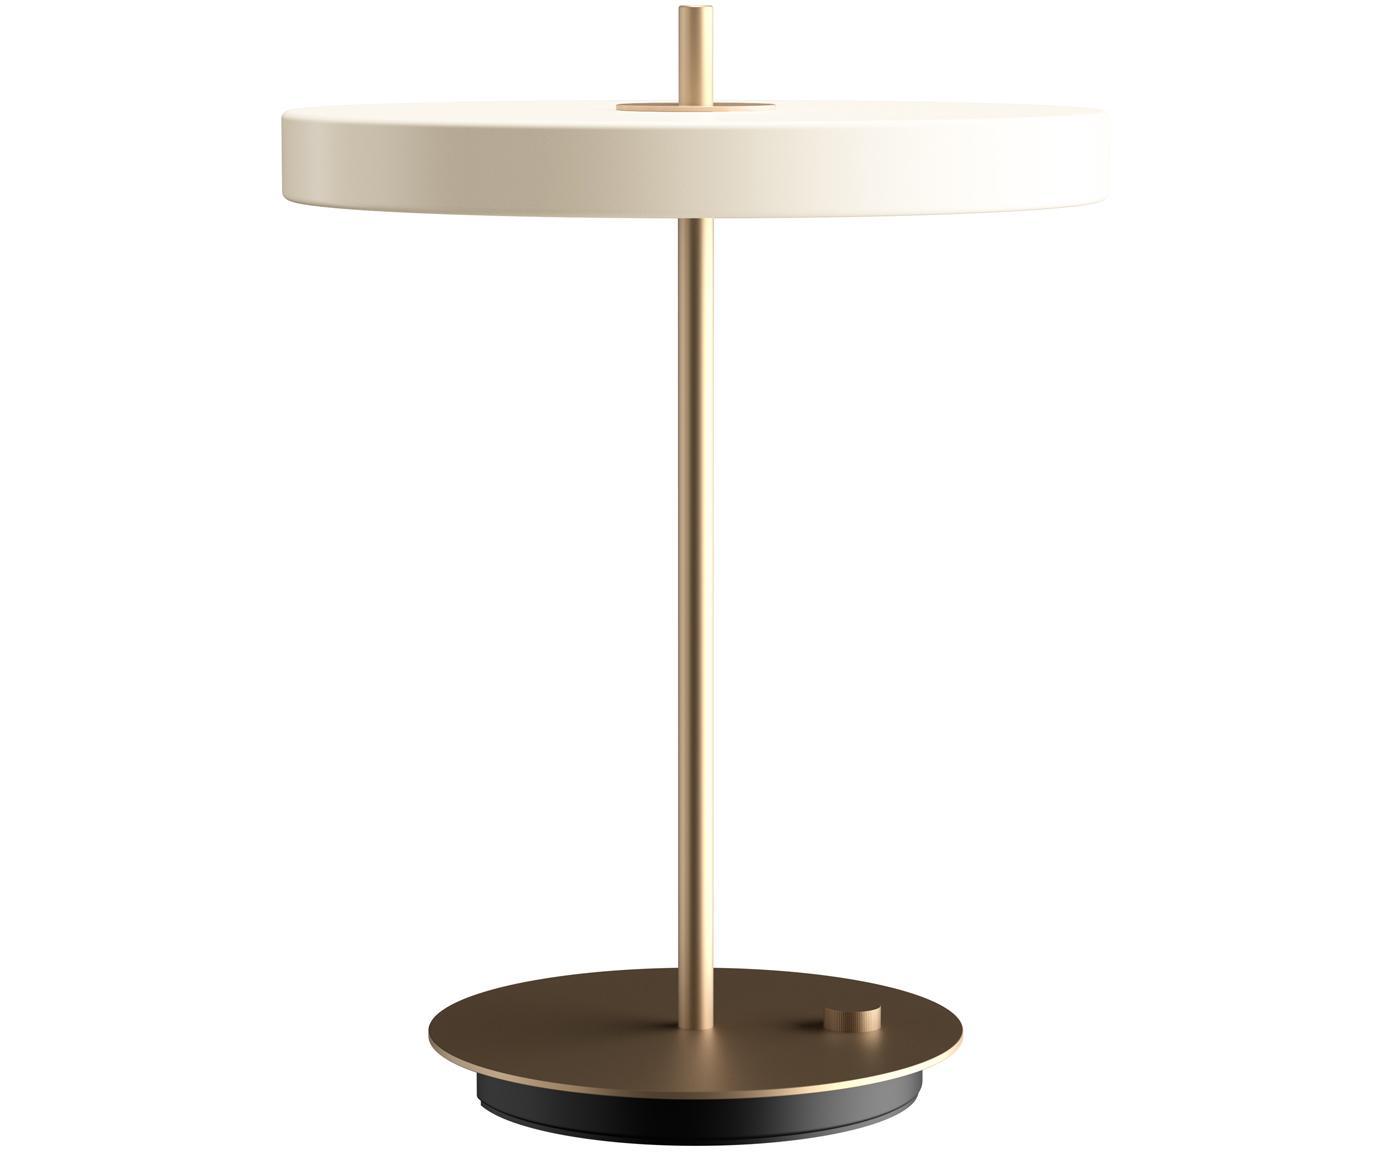 Dimmbare LED Tischleuchte Asteria, Lampenschirm: Aluminium, lackiert, Lampenfuß: Stahl, lackiert, Perlweiß, Goldfarben, Ø 31 x H 42 cm